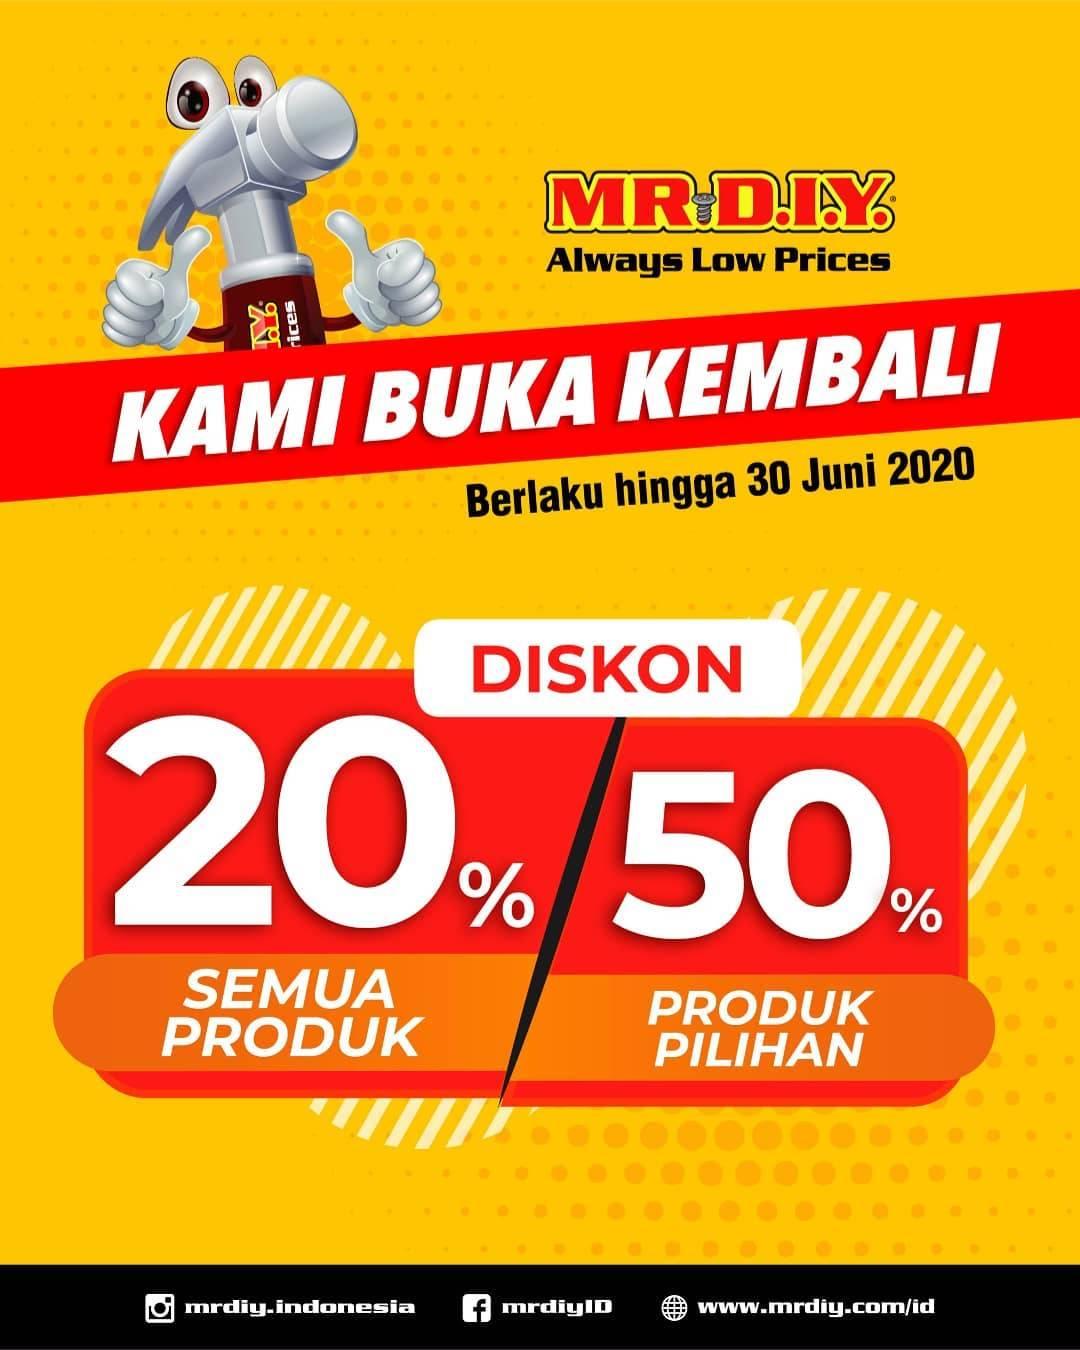 Diskon Promo MR.DIY Diskon 20% Untuk Semua Produk & Diskon Hingga 50% Untuk Produk Favorit